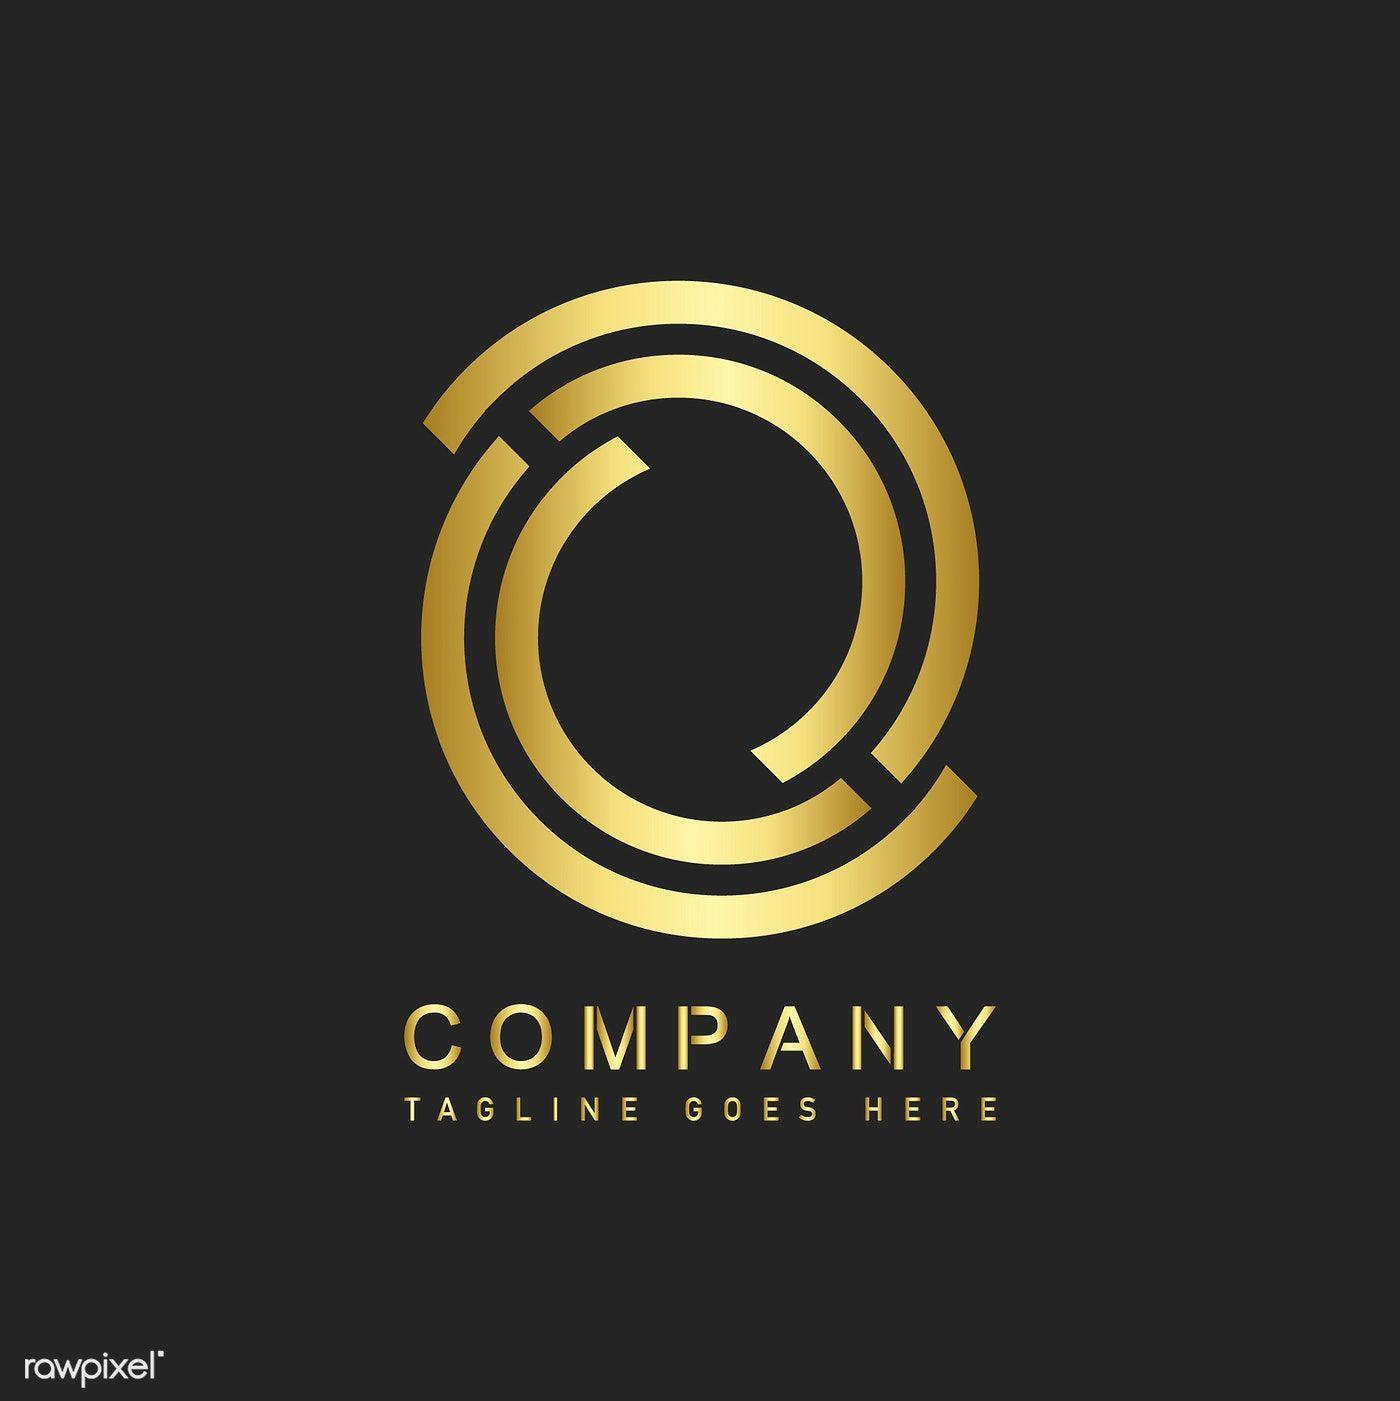 Download premium vector of modern company logo design